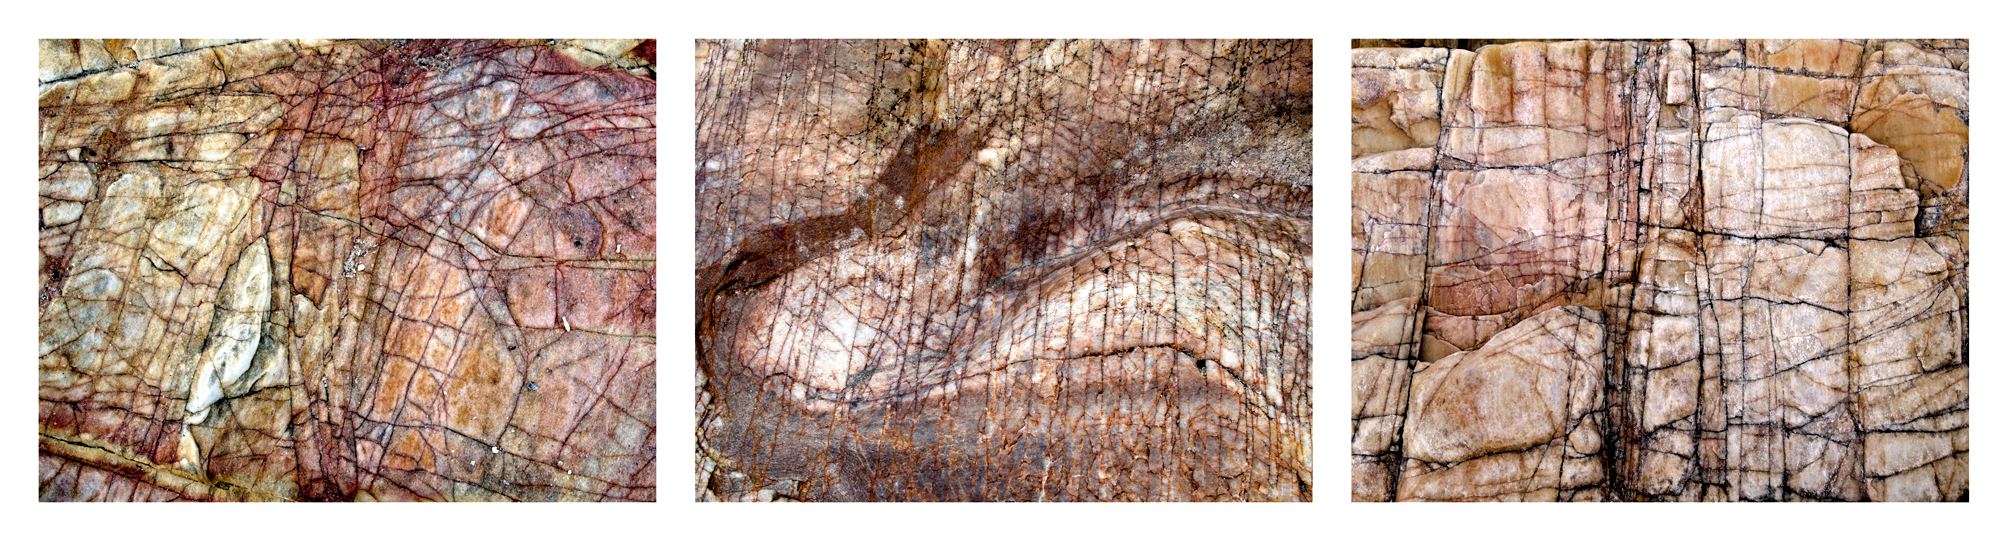 "Sea Writings I,  Ceara Brazil  3 images, 15"" x 20"", 2015"